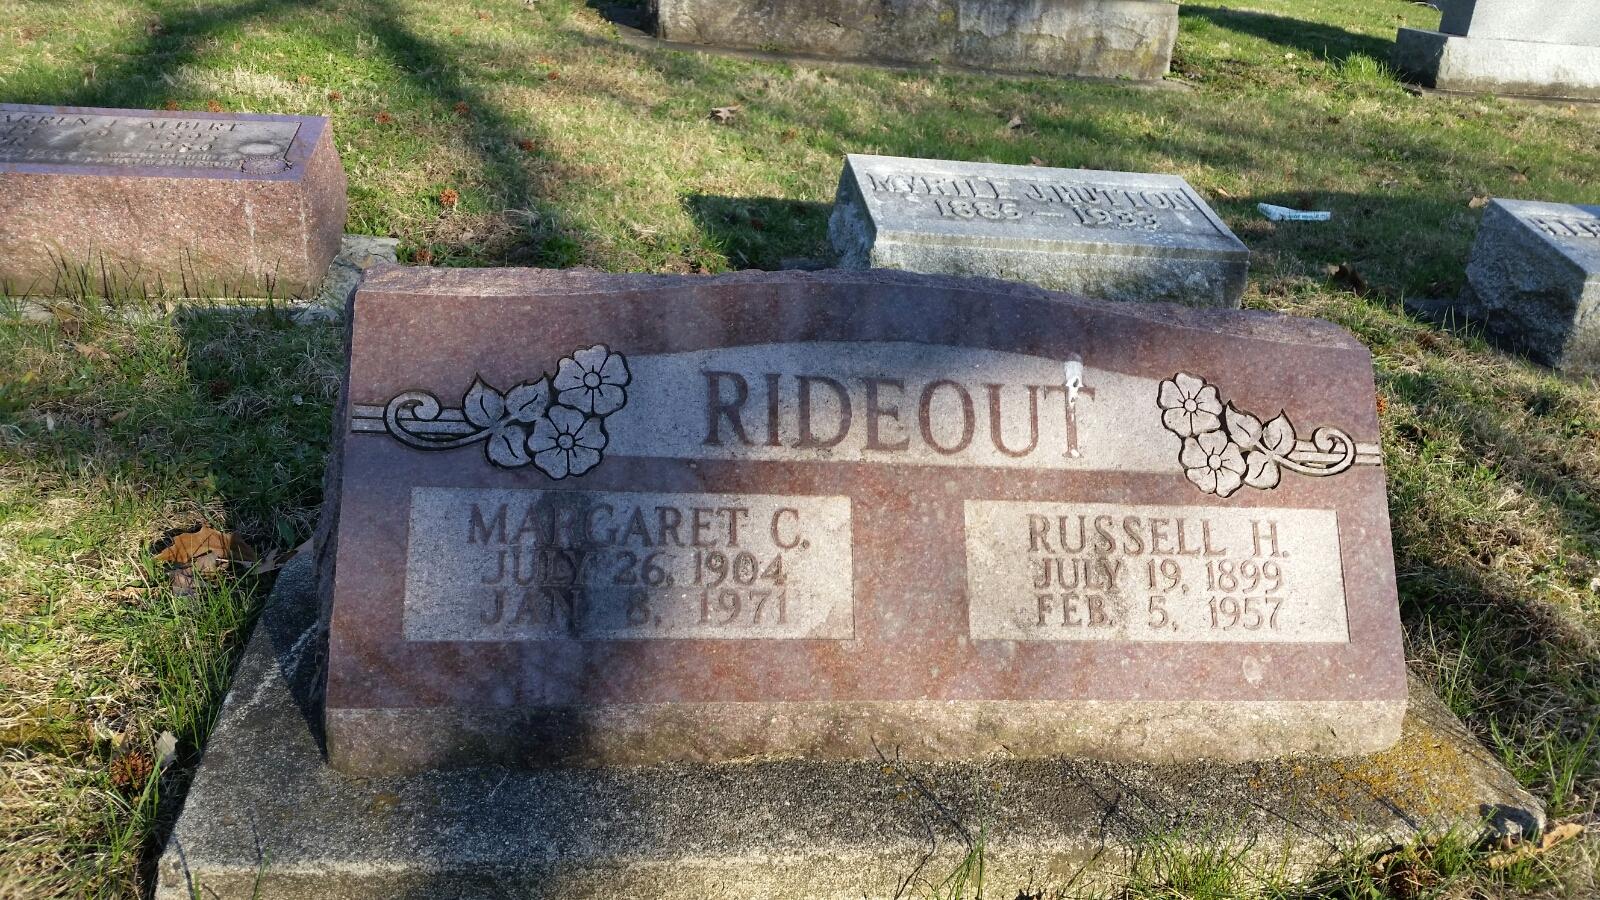 Margaret Rideout